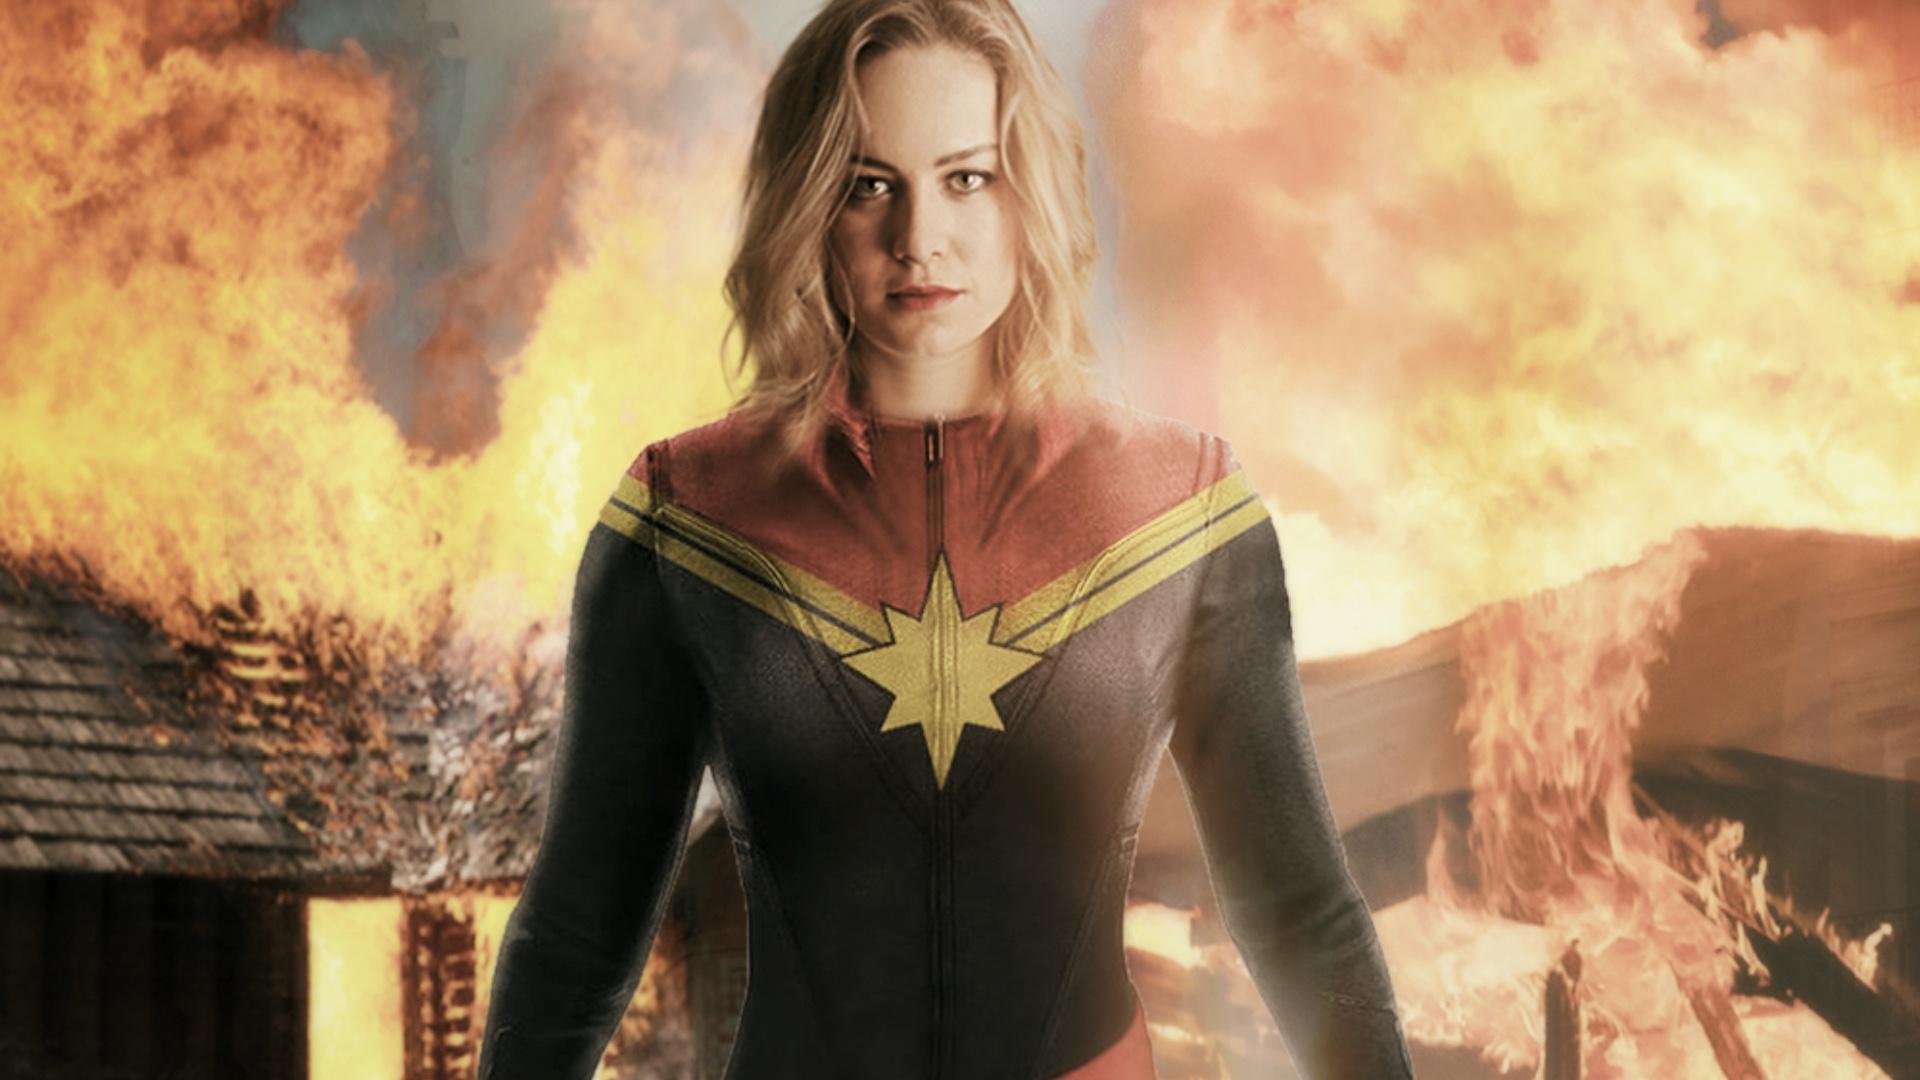 Captain Marvel Movie Wallpaper 1920x1080